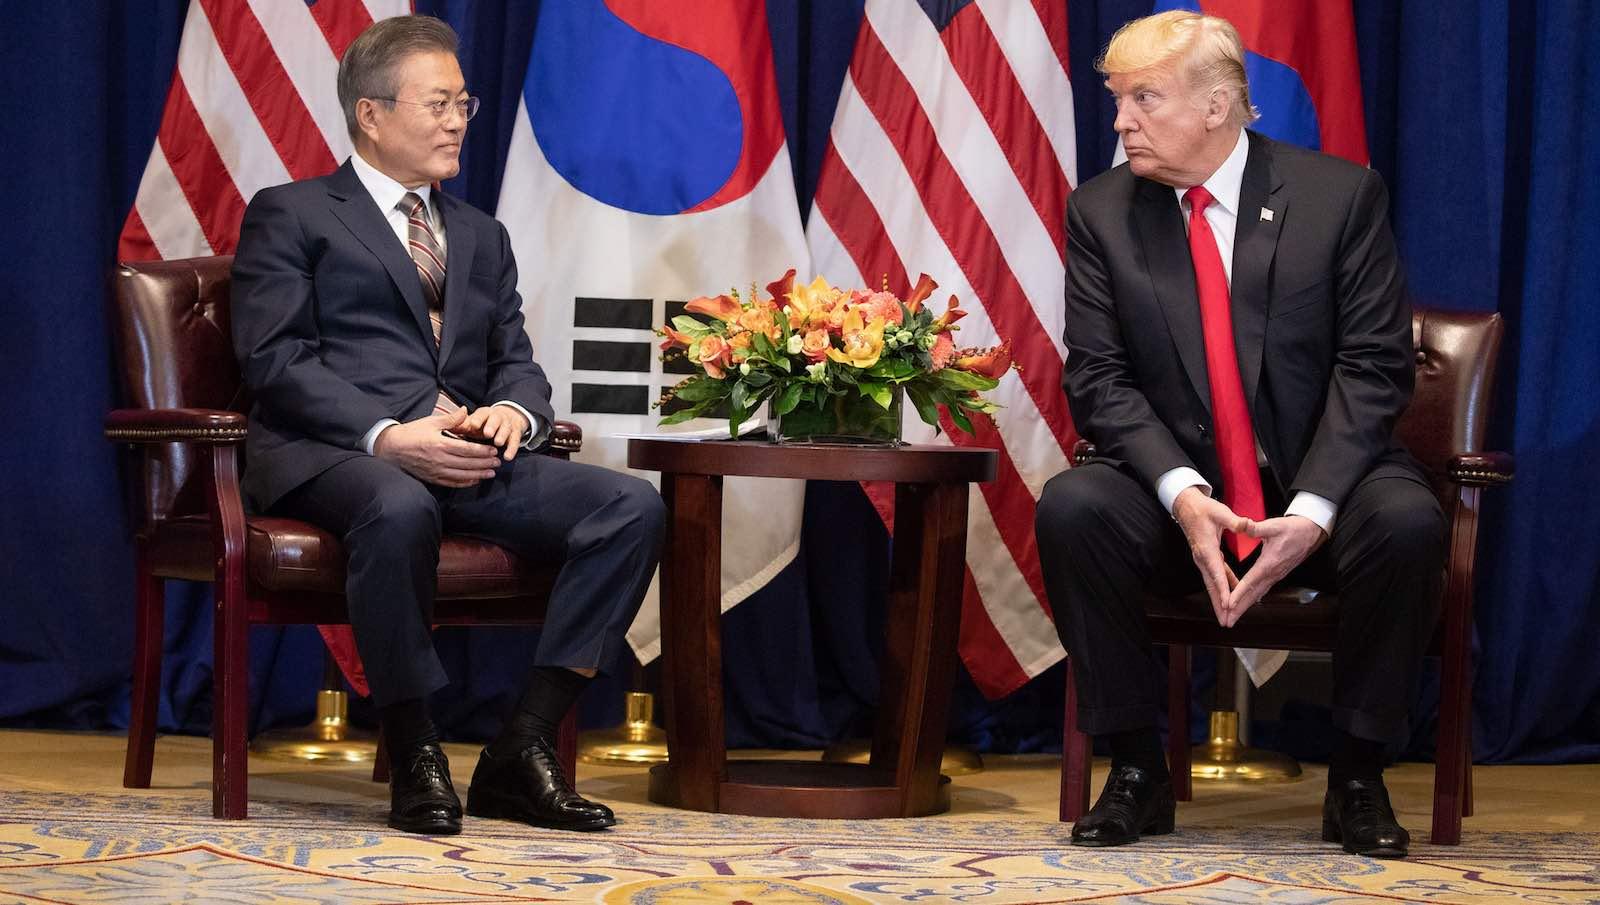 US President Donald Trump and South Korea's Moon Jae-in on 24 September 2018 in New York (Photo: Shealah Craighead/White House)